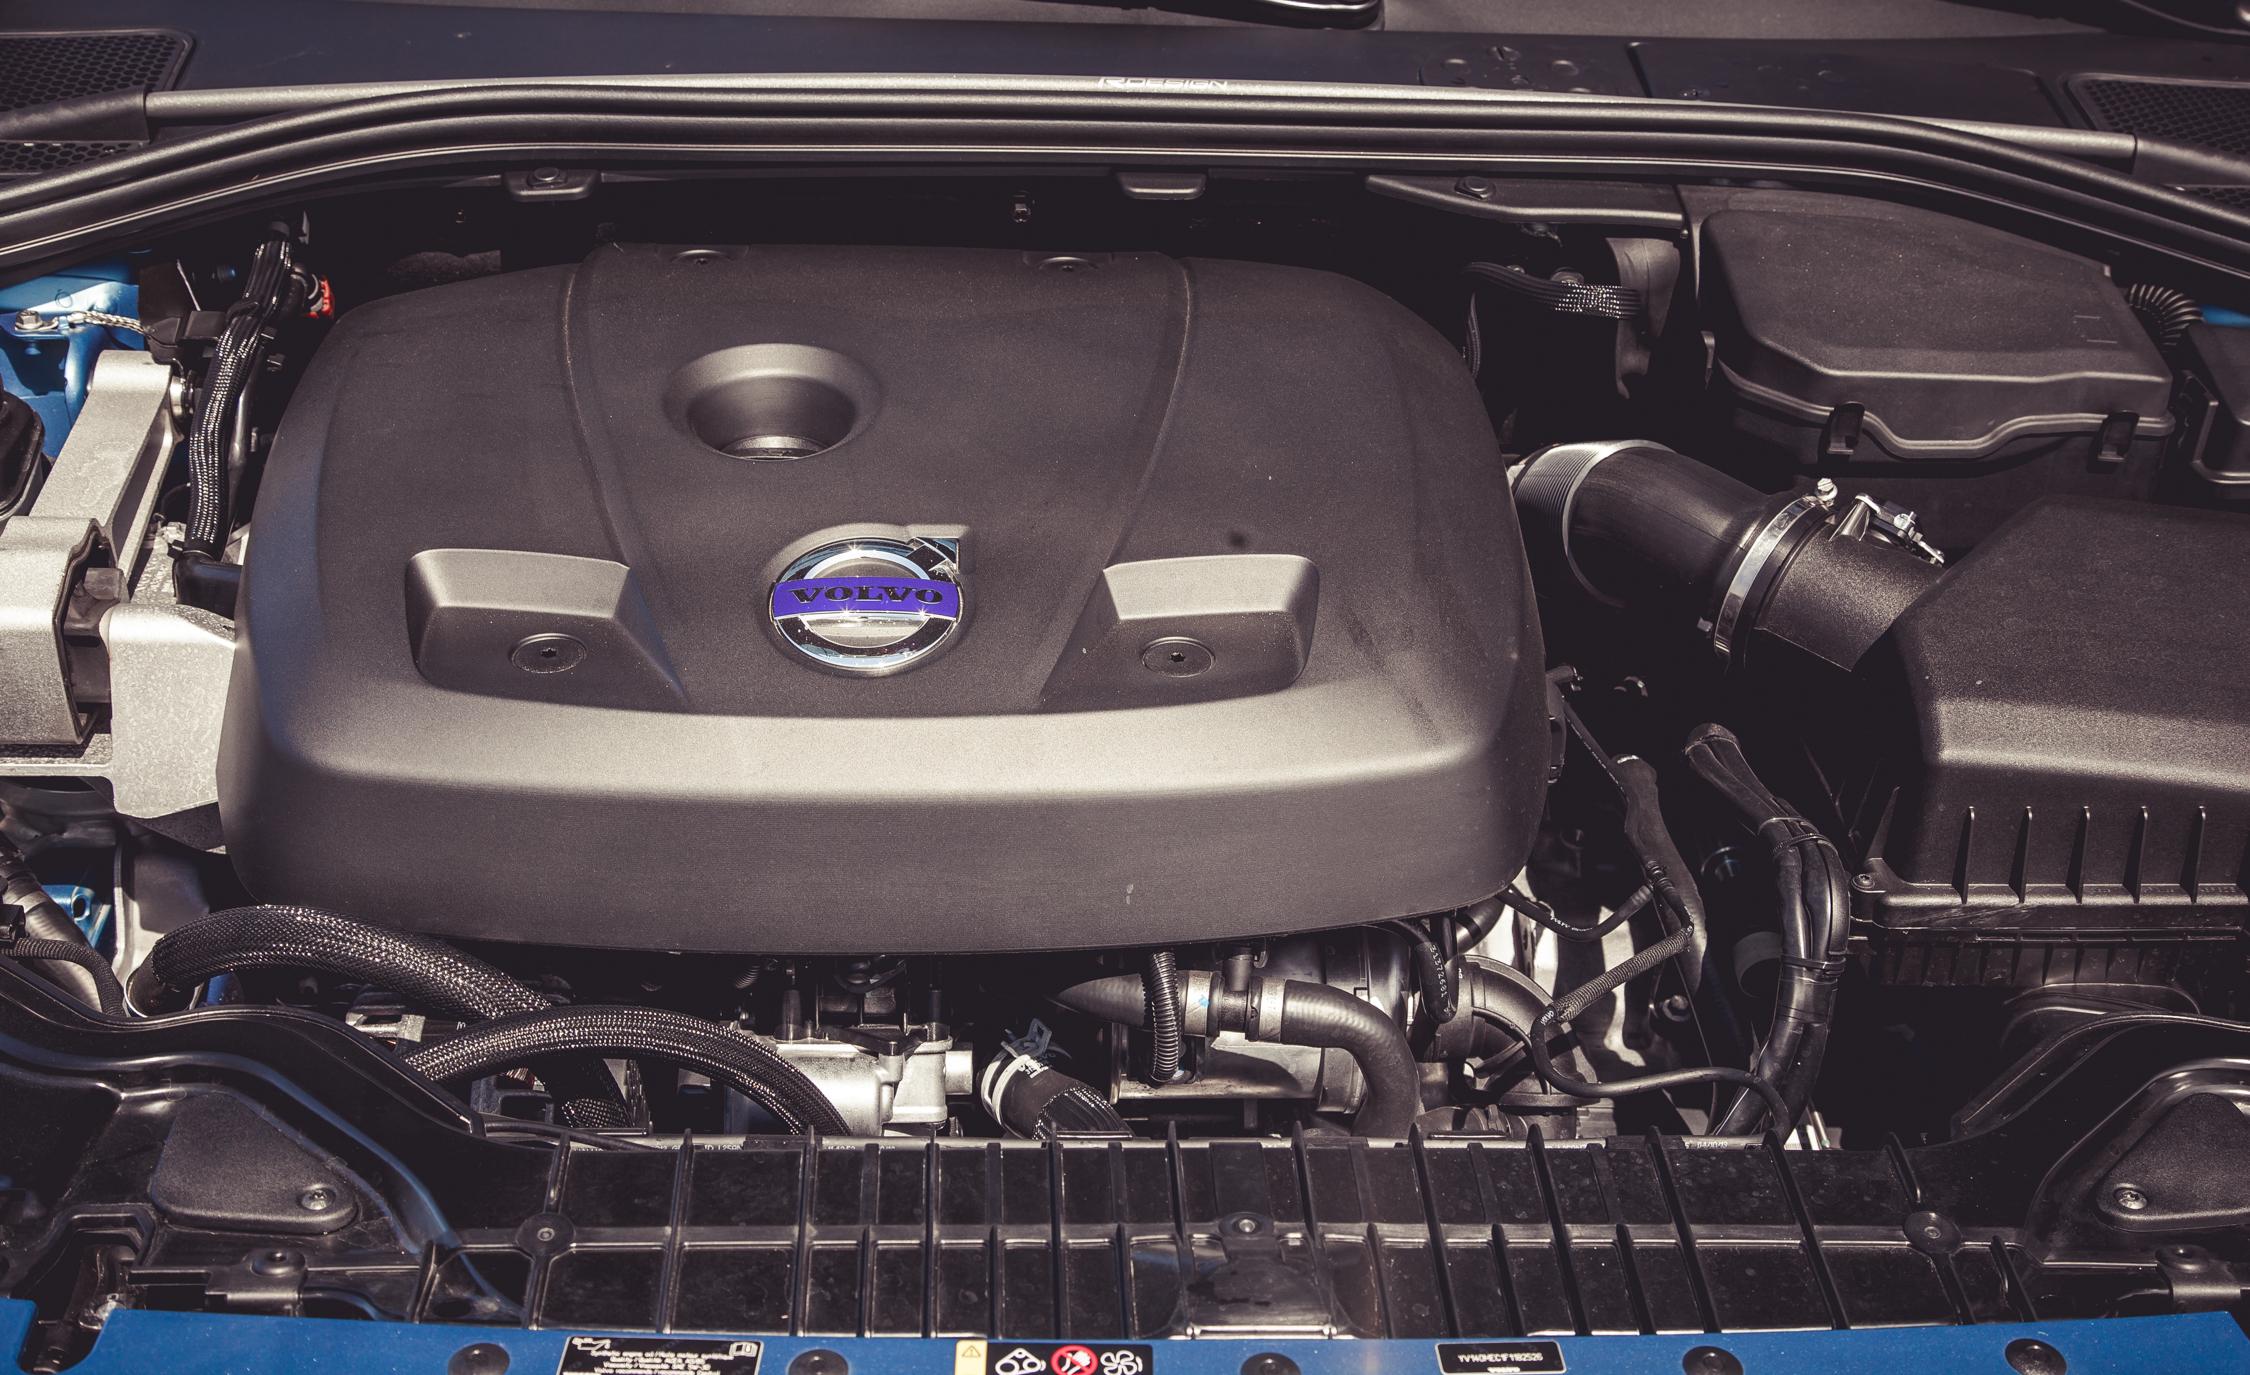 2015 Volvo V60 Turbocharged 2.0-Liter Inline-4 Engine